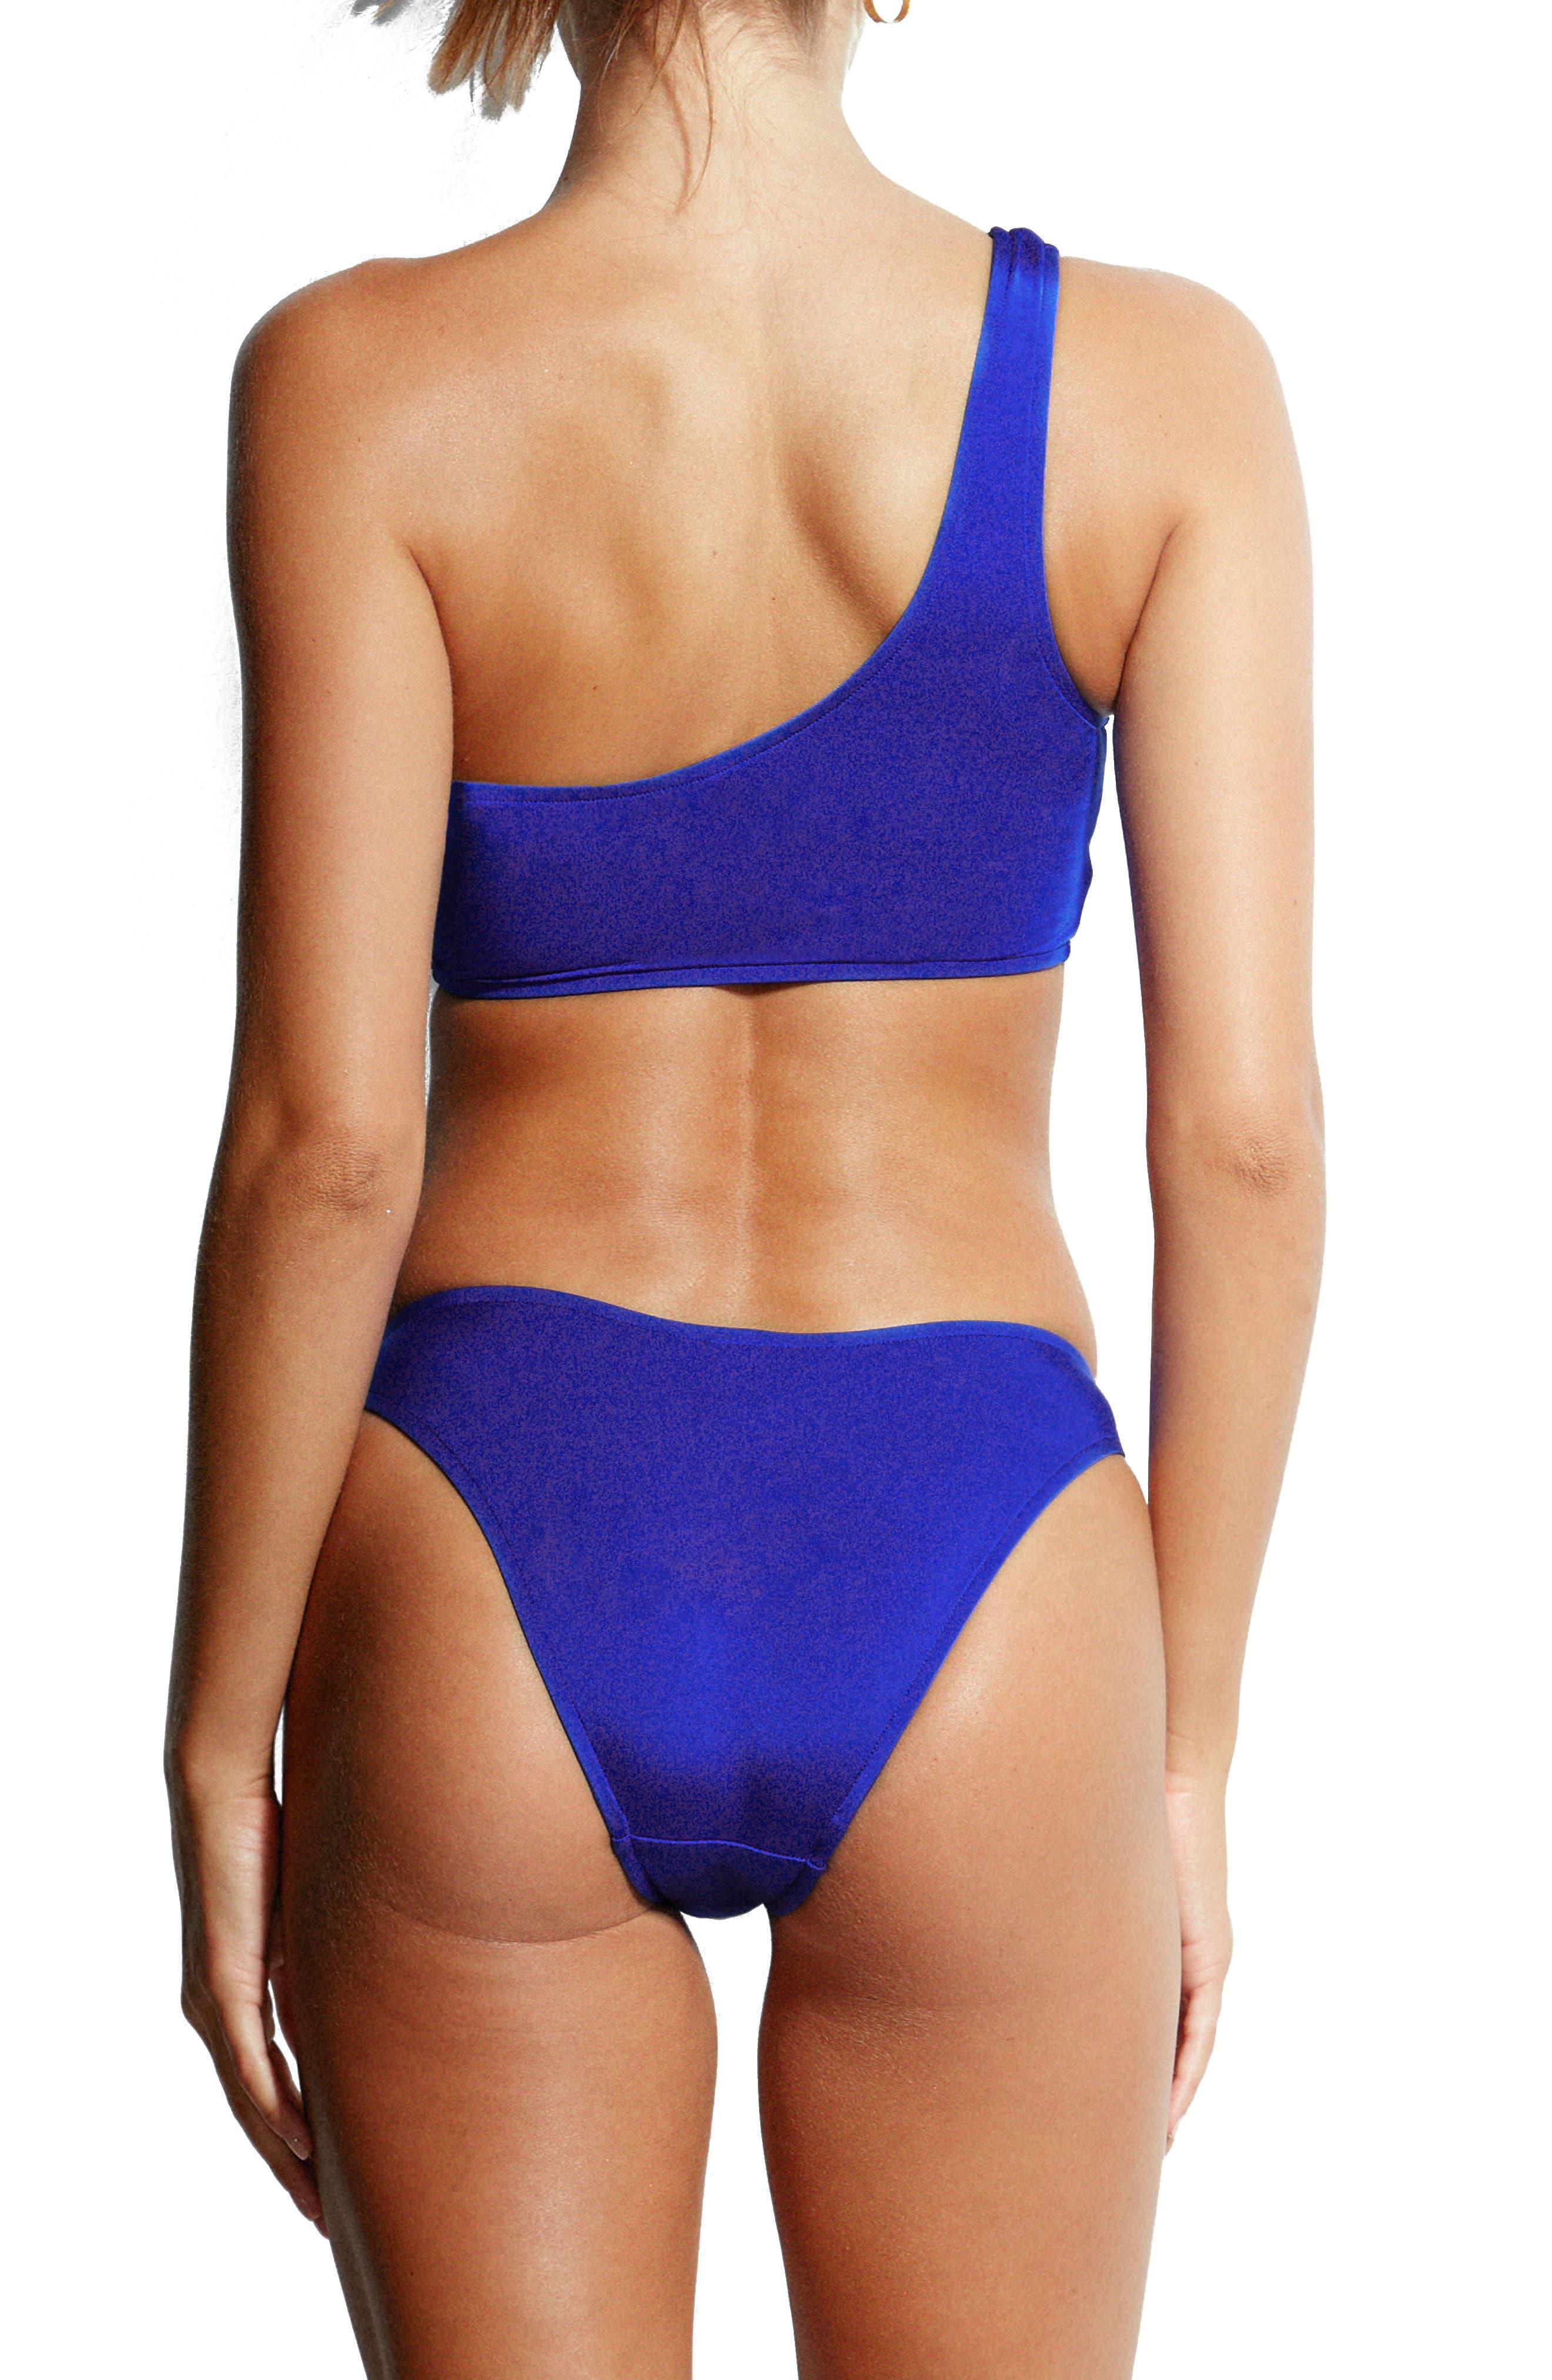 Pheonix High Leg Bikini Bottoms,                             Alternate thumbnail 4, color,                             Blue Ray